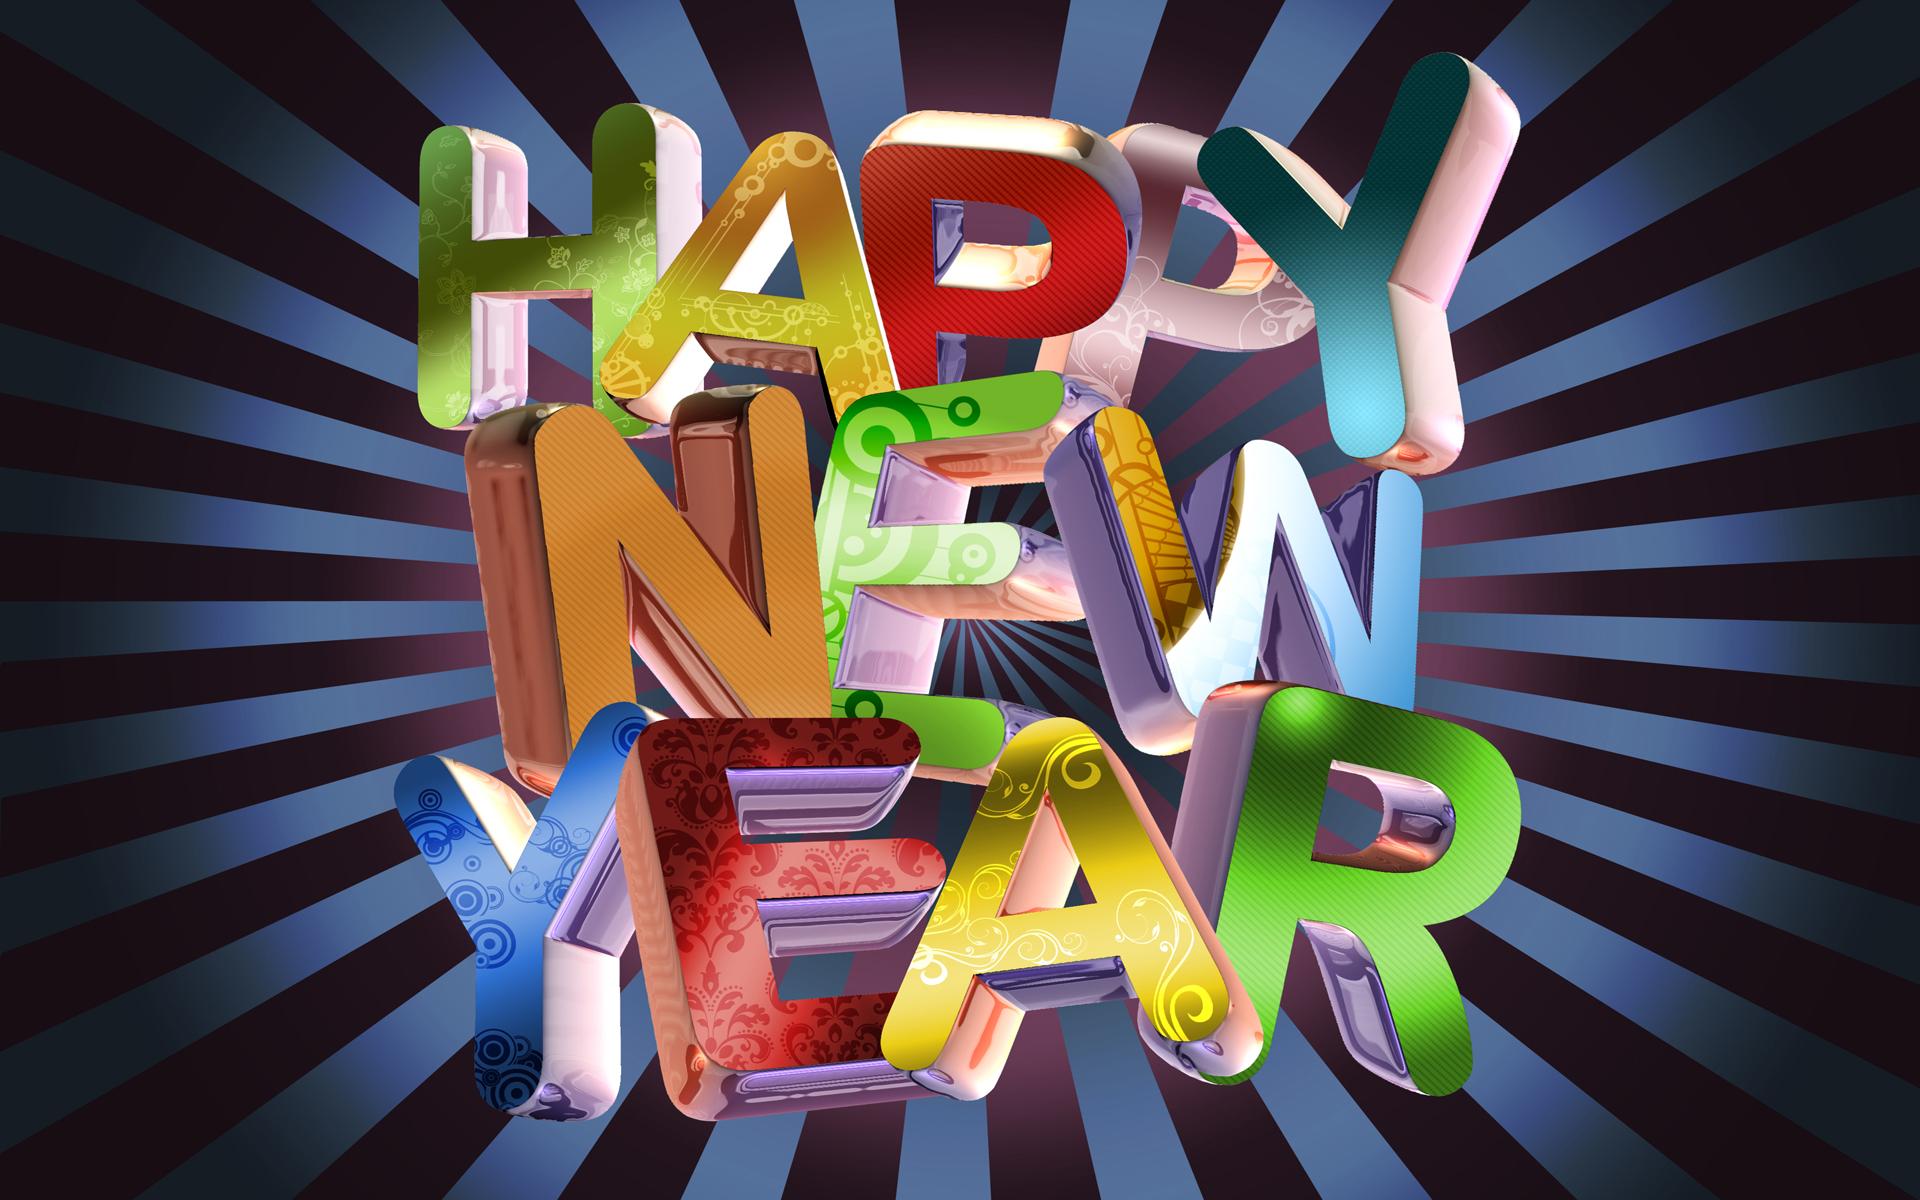 3d stunning new year wallpaper image